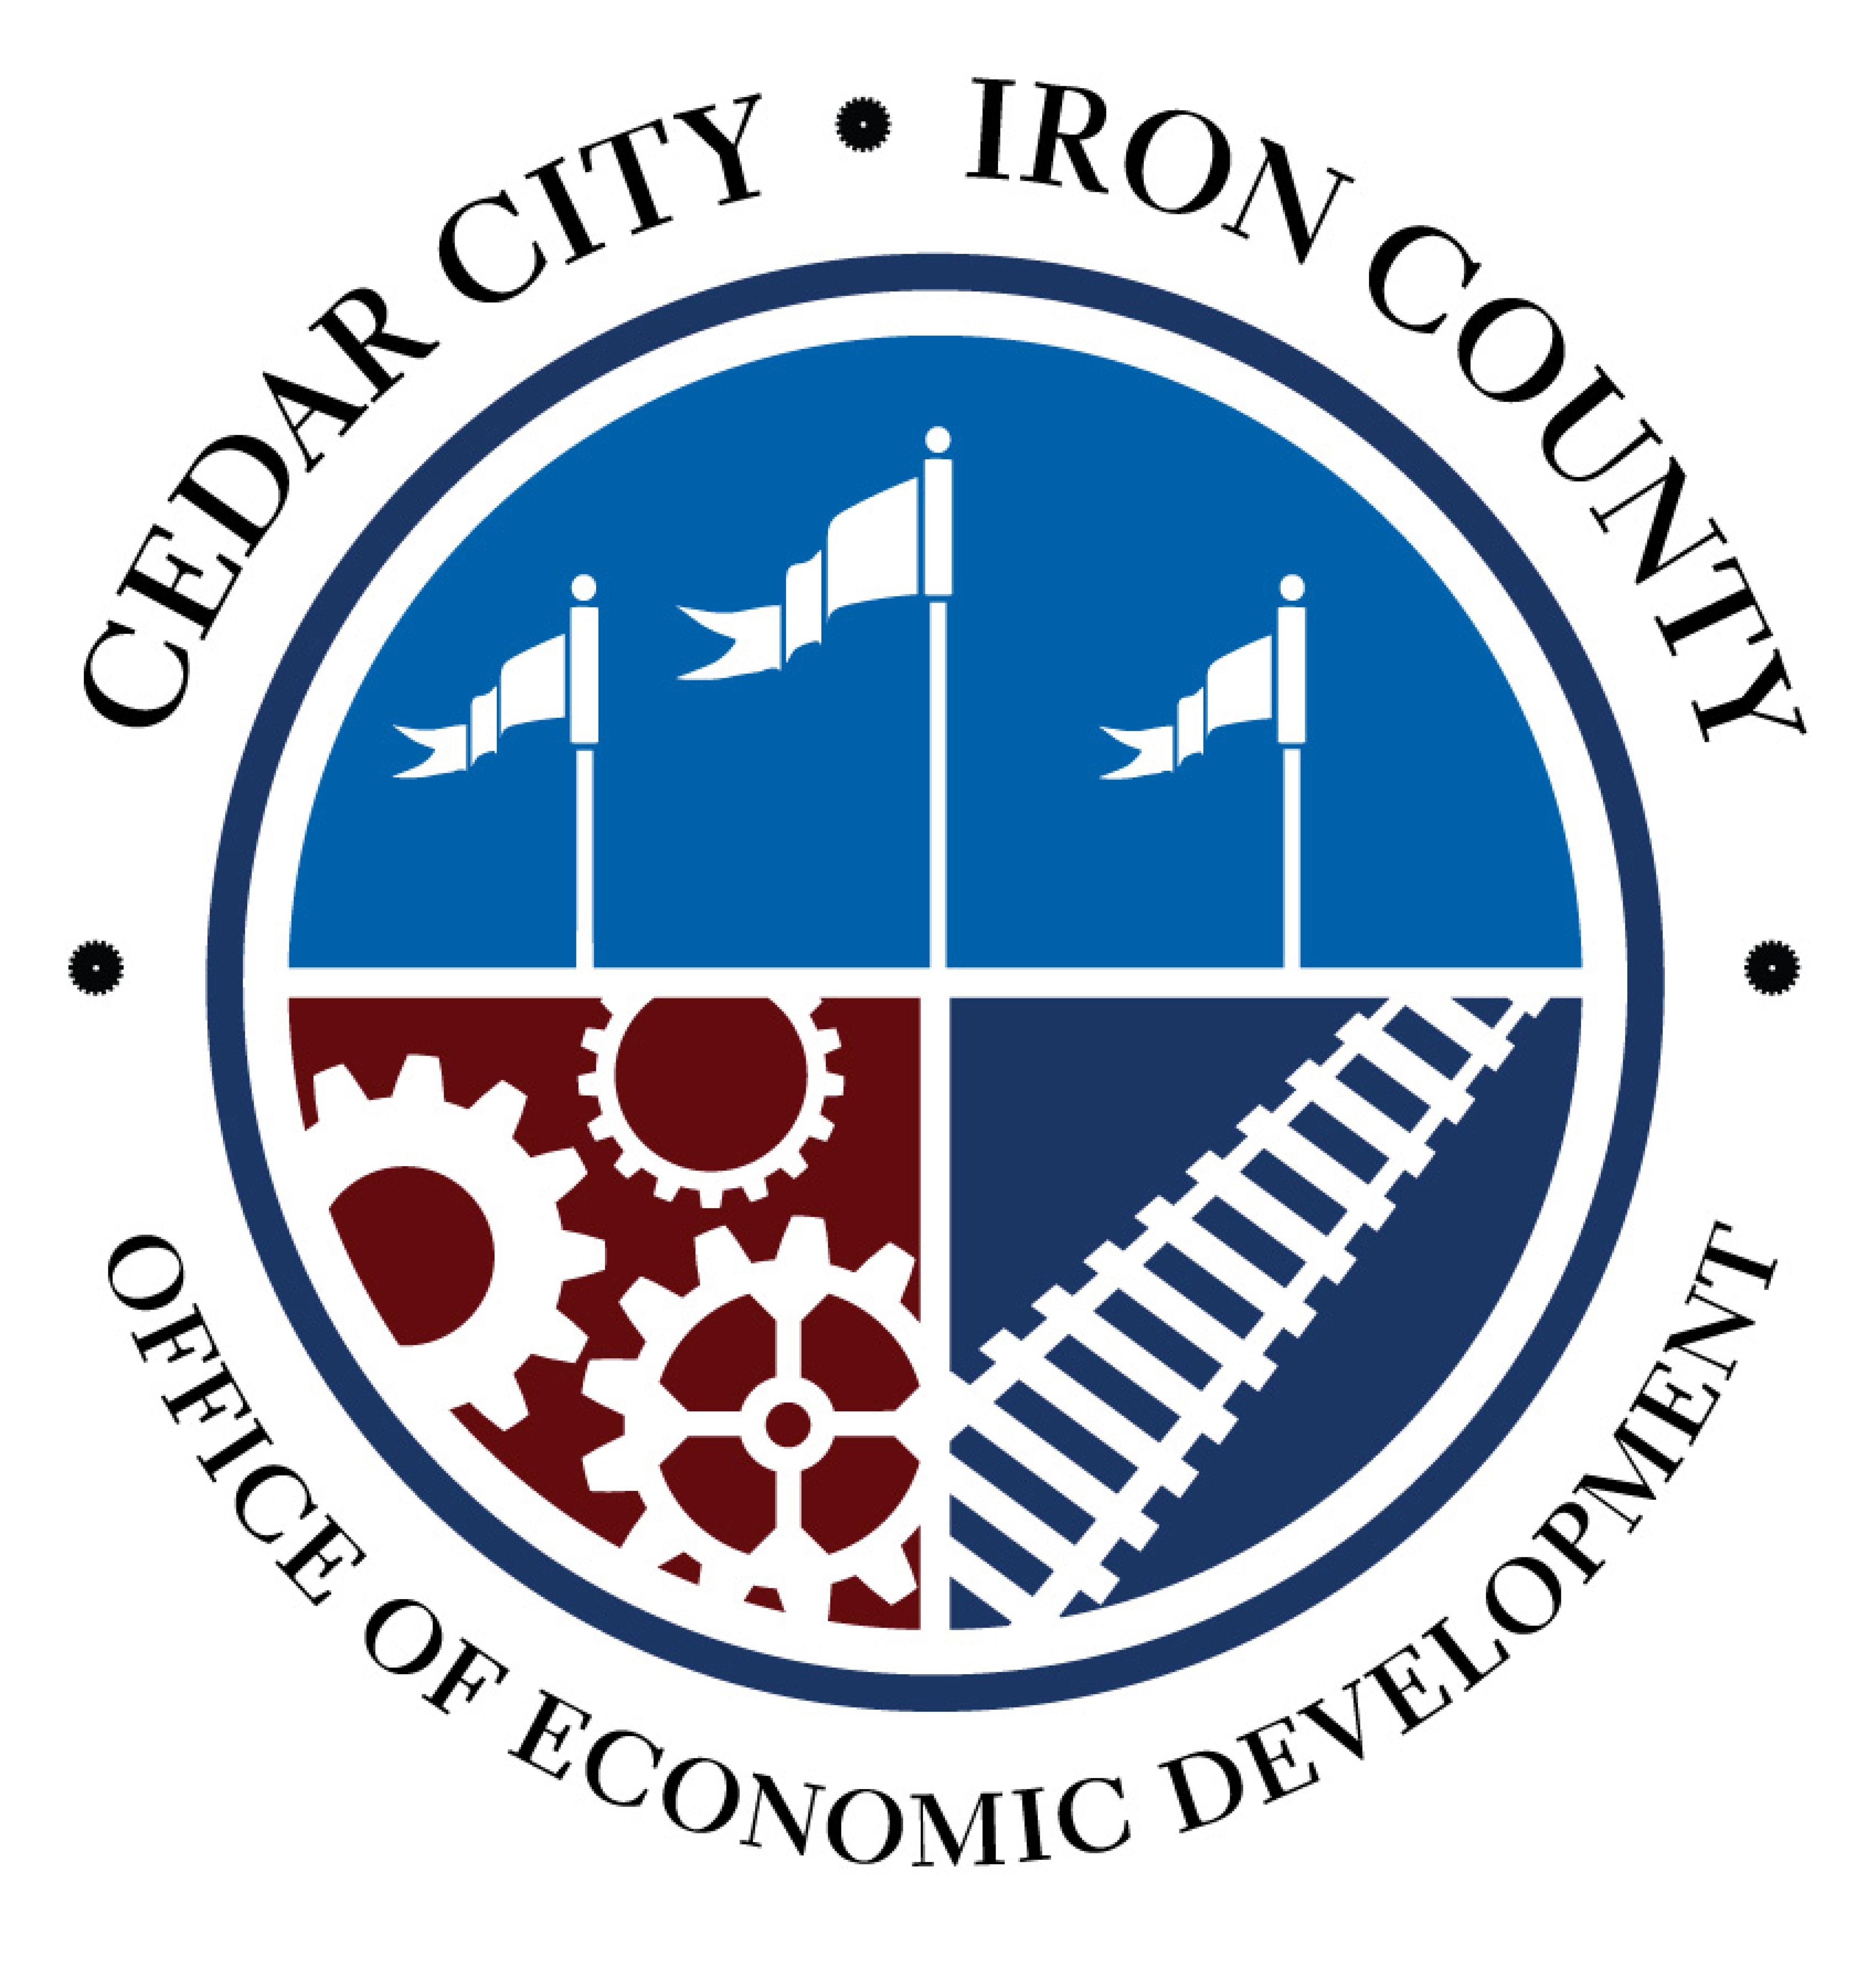 Cedar City * Iron County Utah Office of Economic Development.